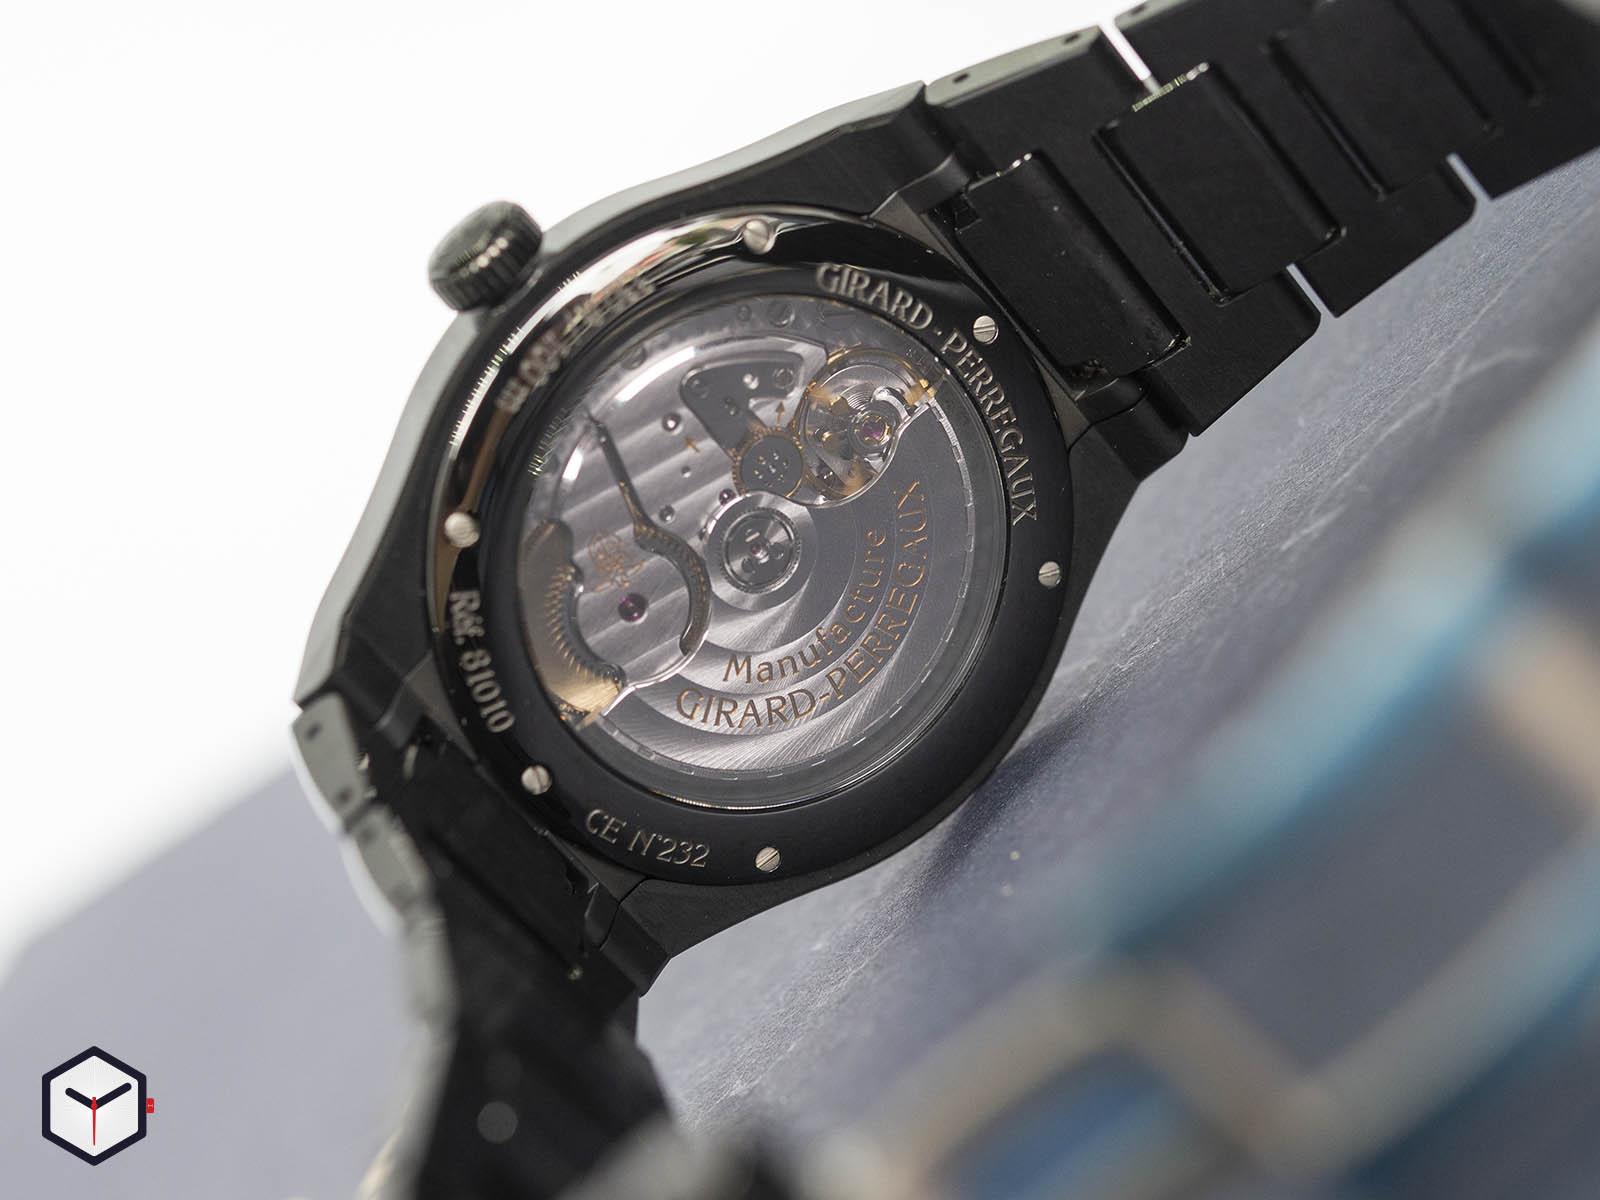 81010-32-631-32a-girard-perregaux-laureato-42mm-ceramic-5.jpg